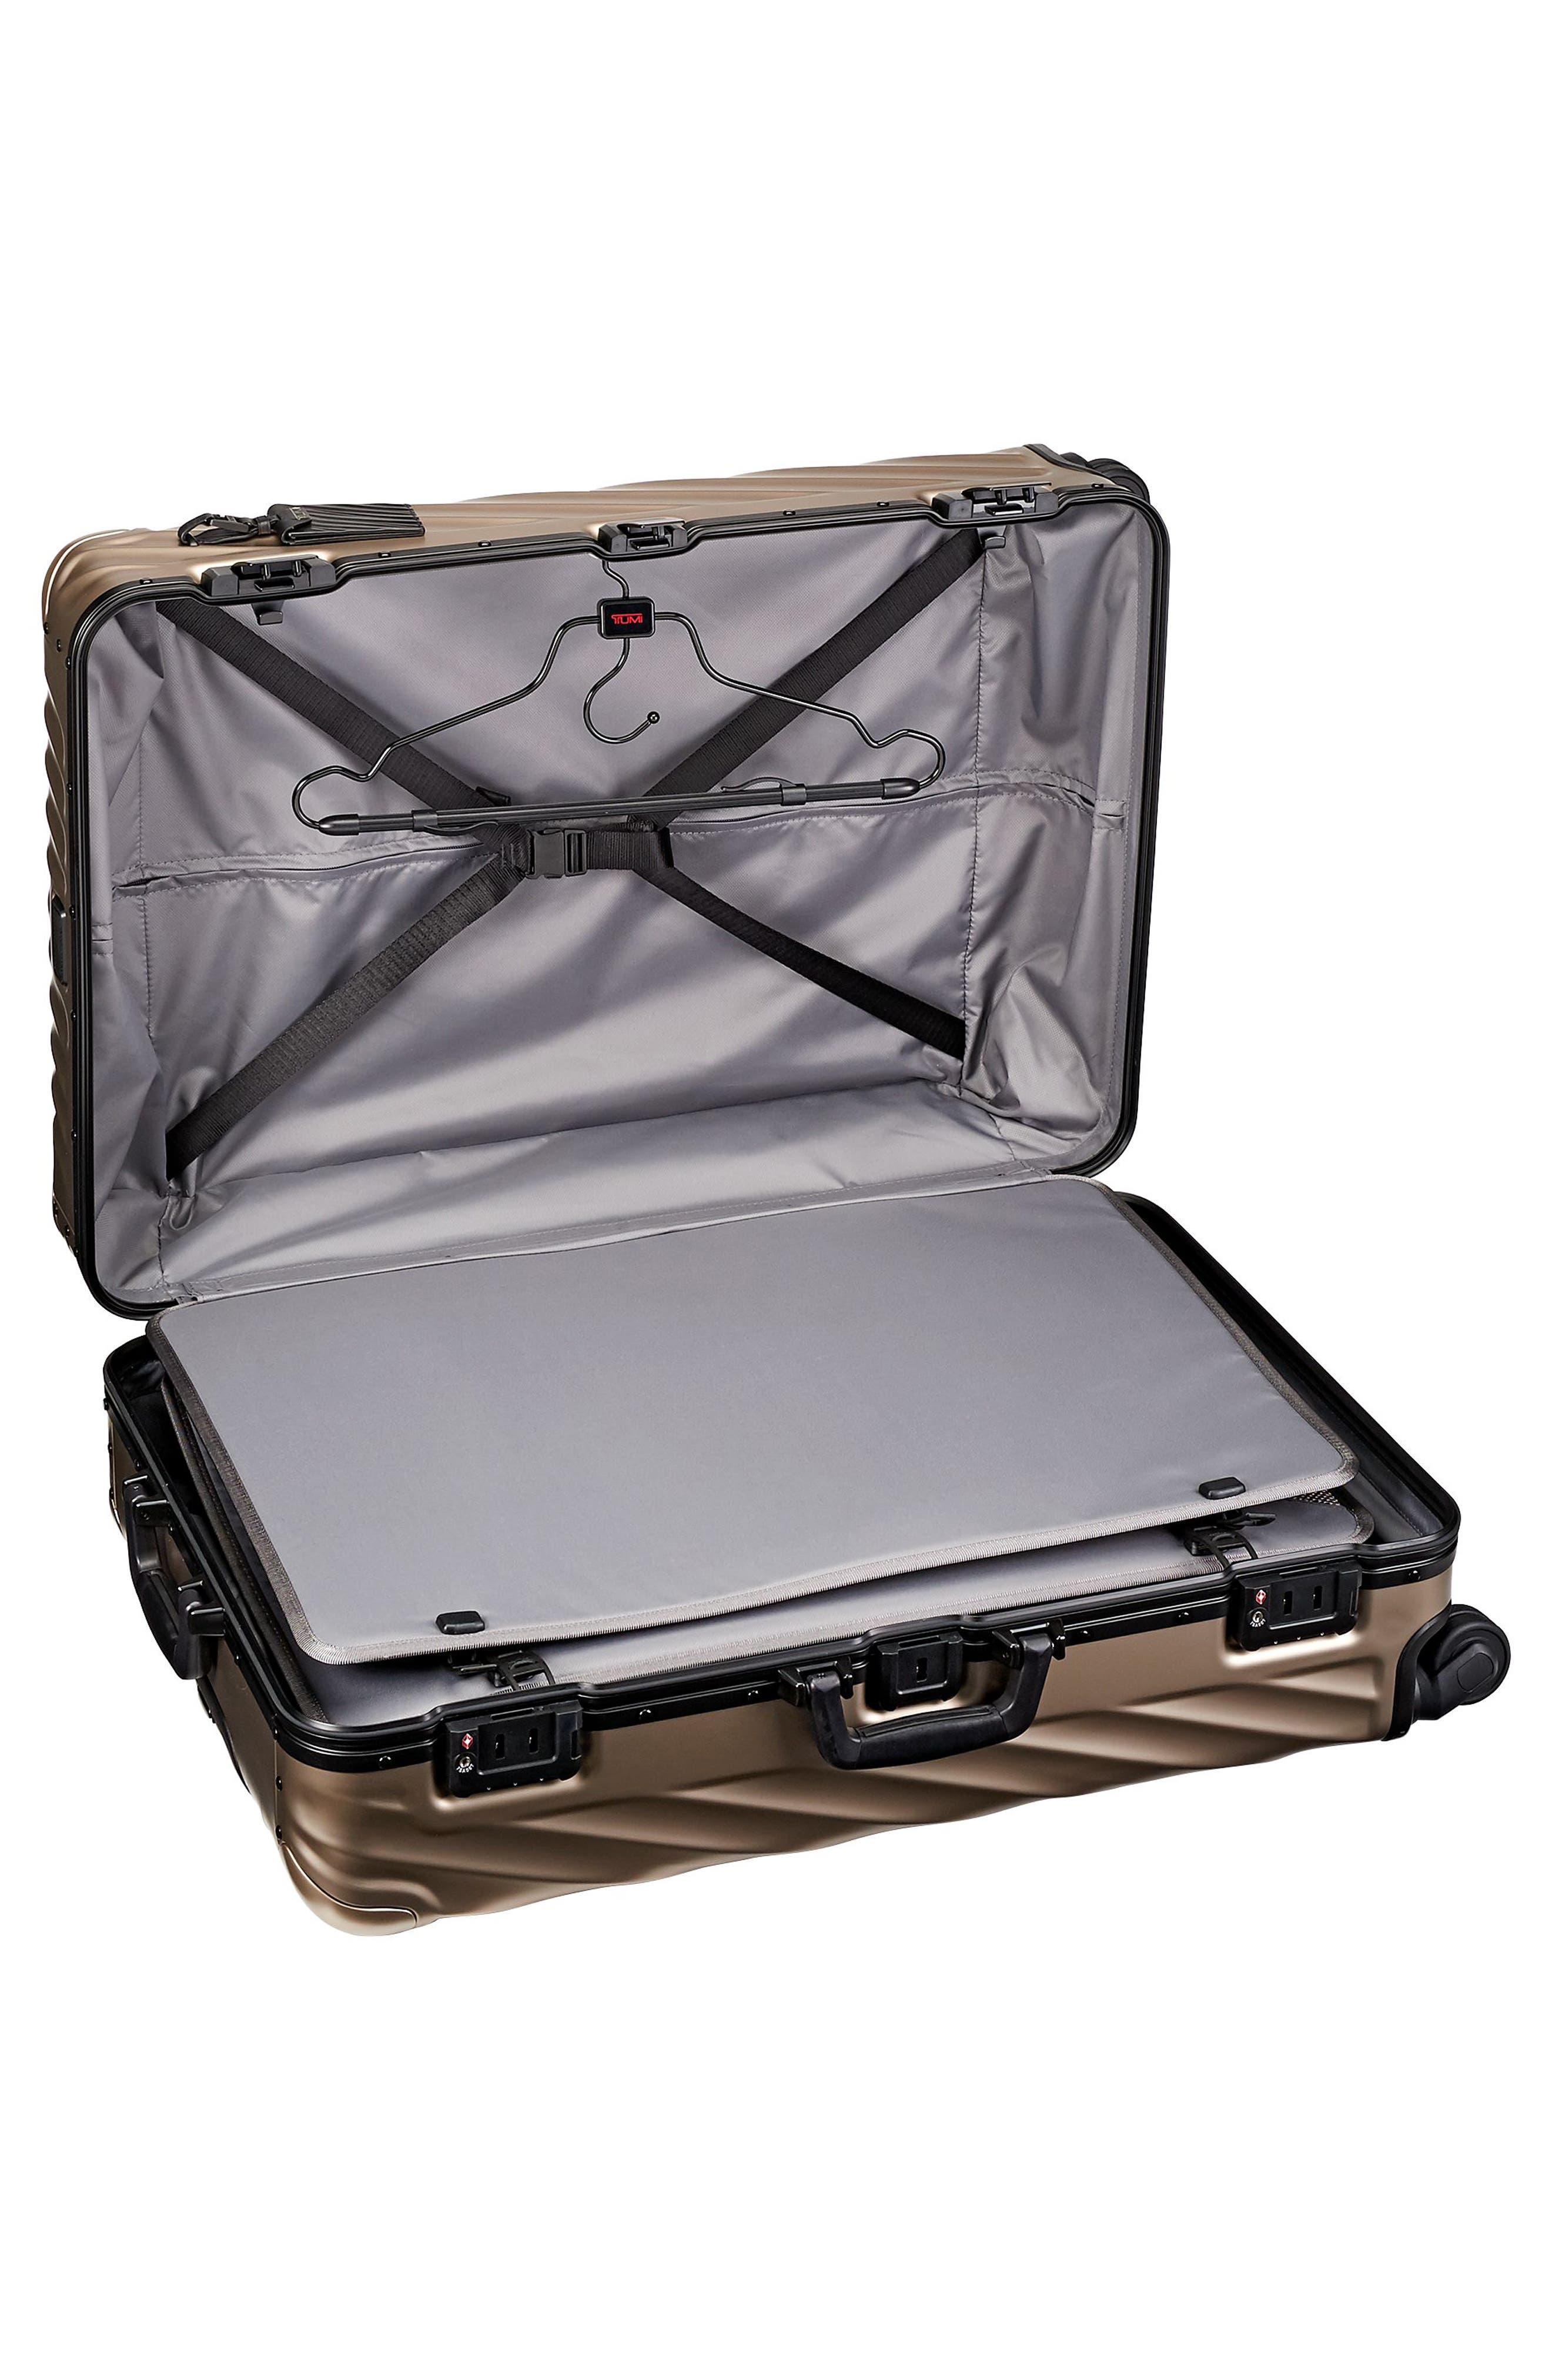 19-Degree 30-Inch Aluminum Spinner Packing Case,                             Alternate thumbnail 2, color,                             Ivory Gold